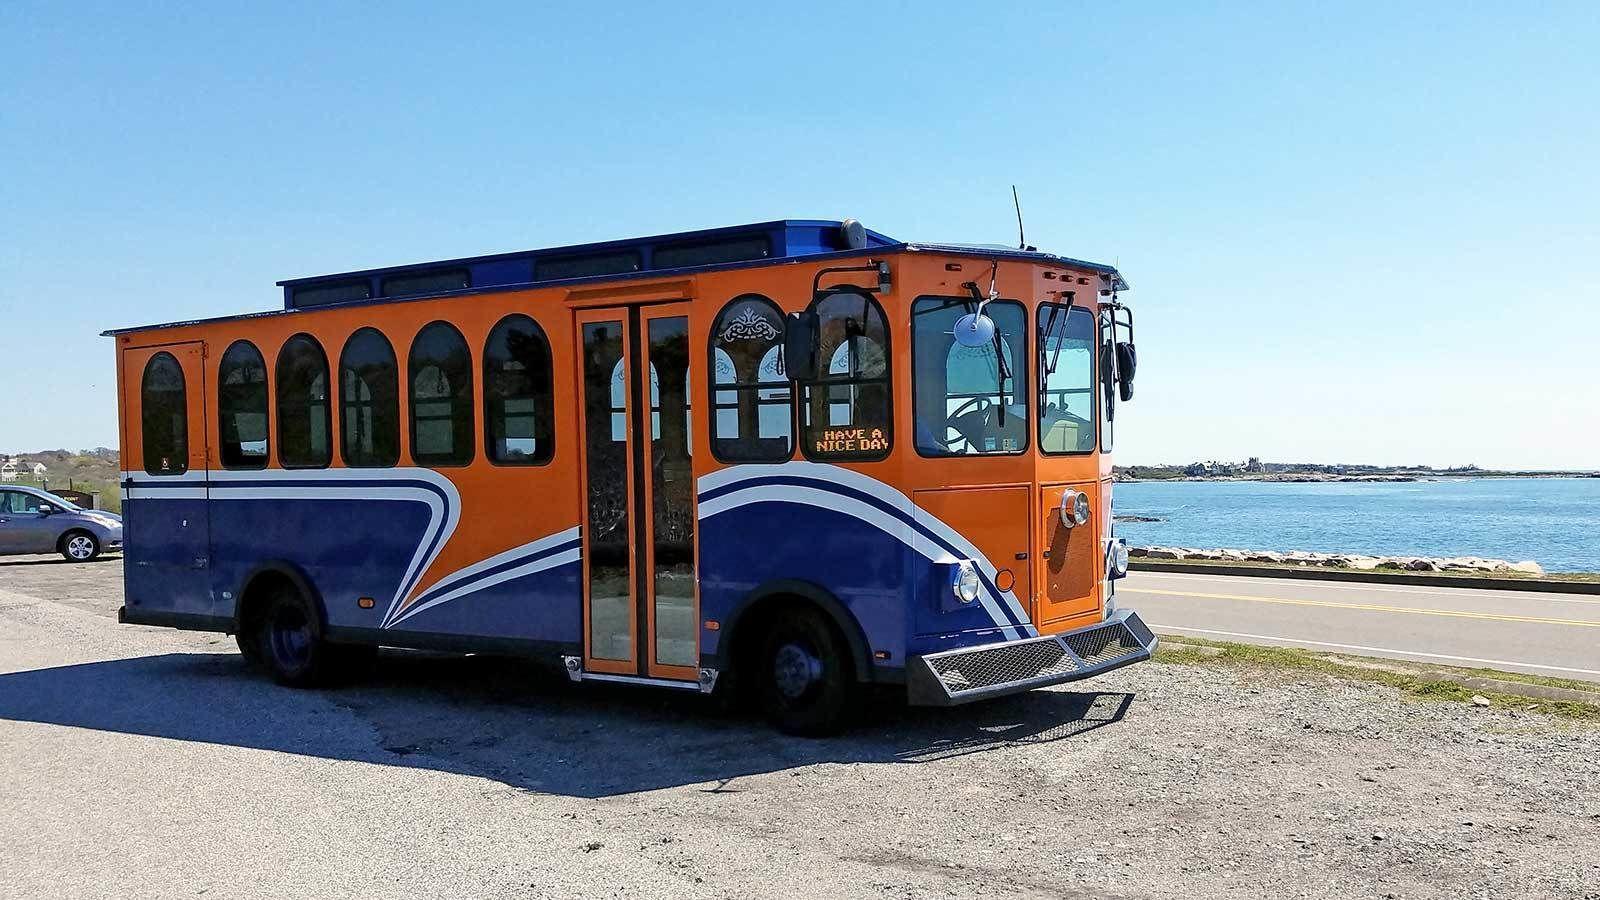 bus trolley along the beach in Newport